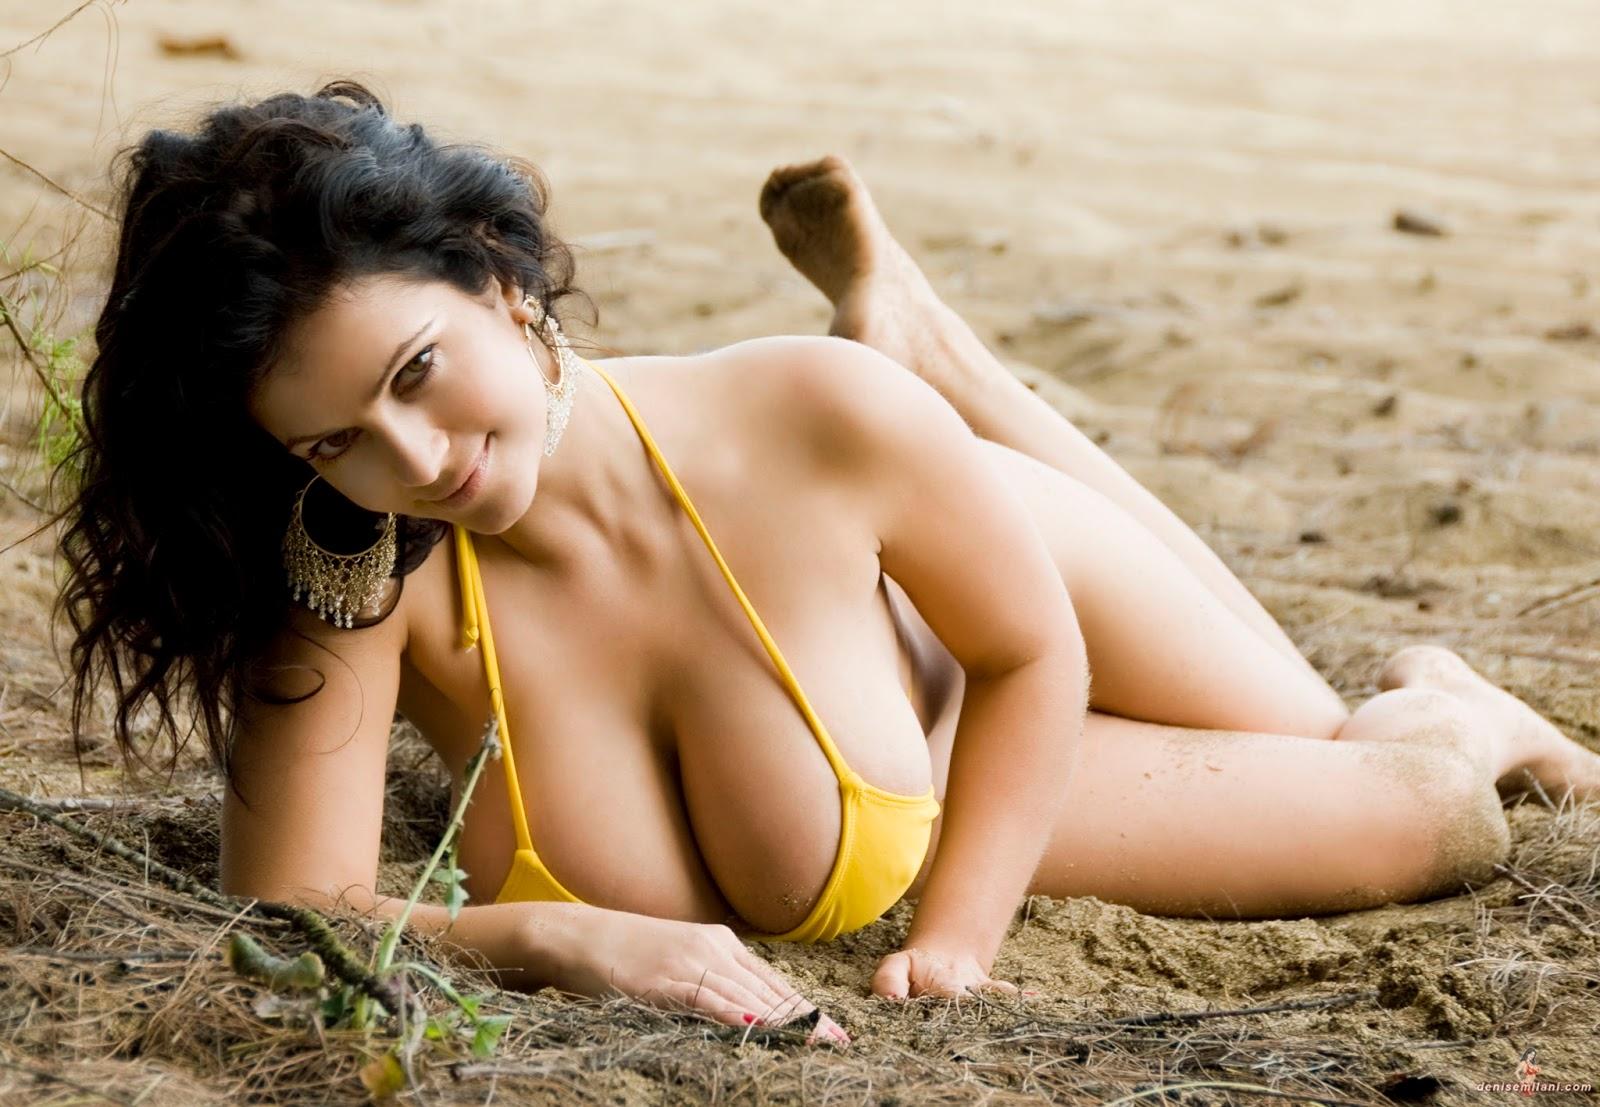 Denise Milani Sexiest Photoshoots: Denise Milani: Yellow Bikini